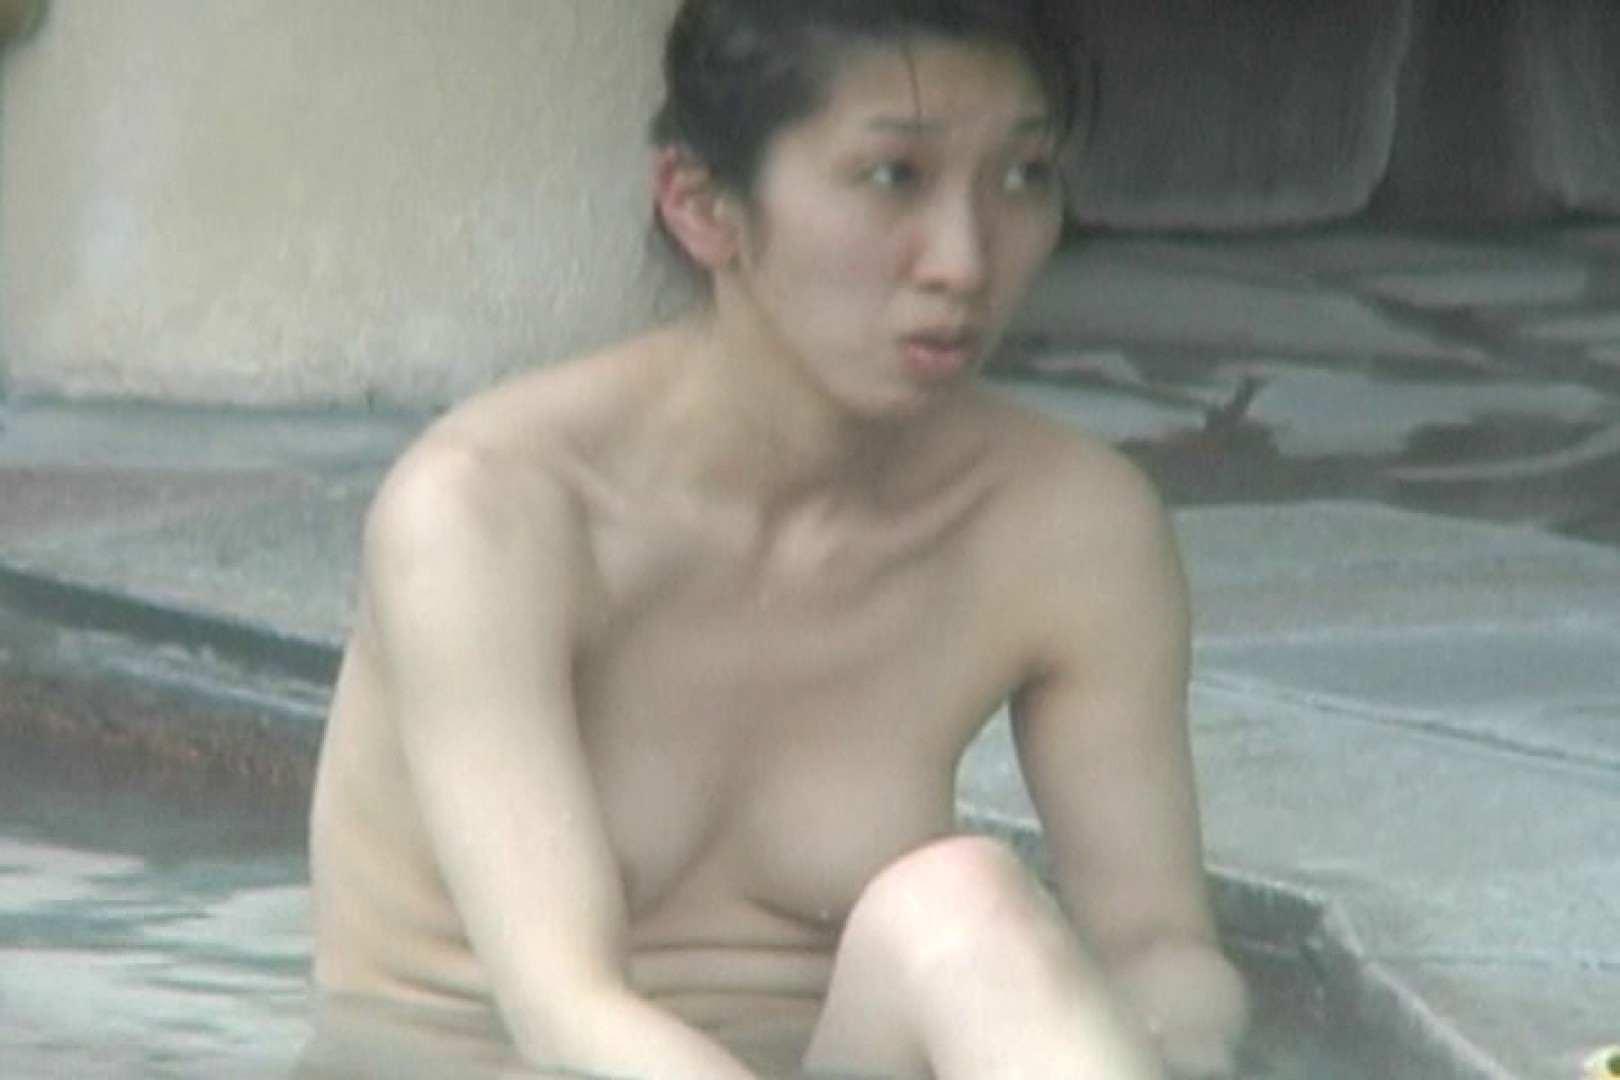 Aquaな露天風呂Vol.588 露天風呂 エロ画像 53連発 11